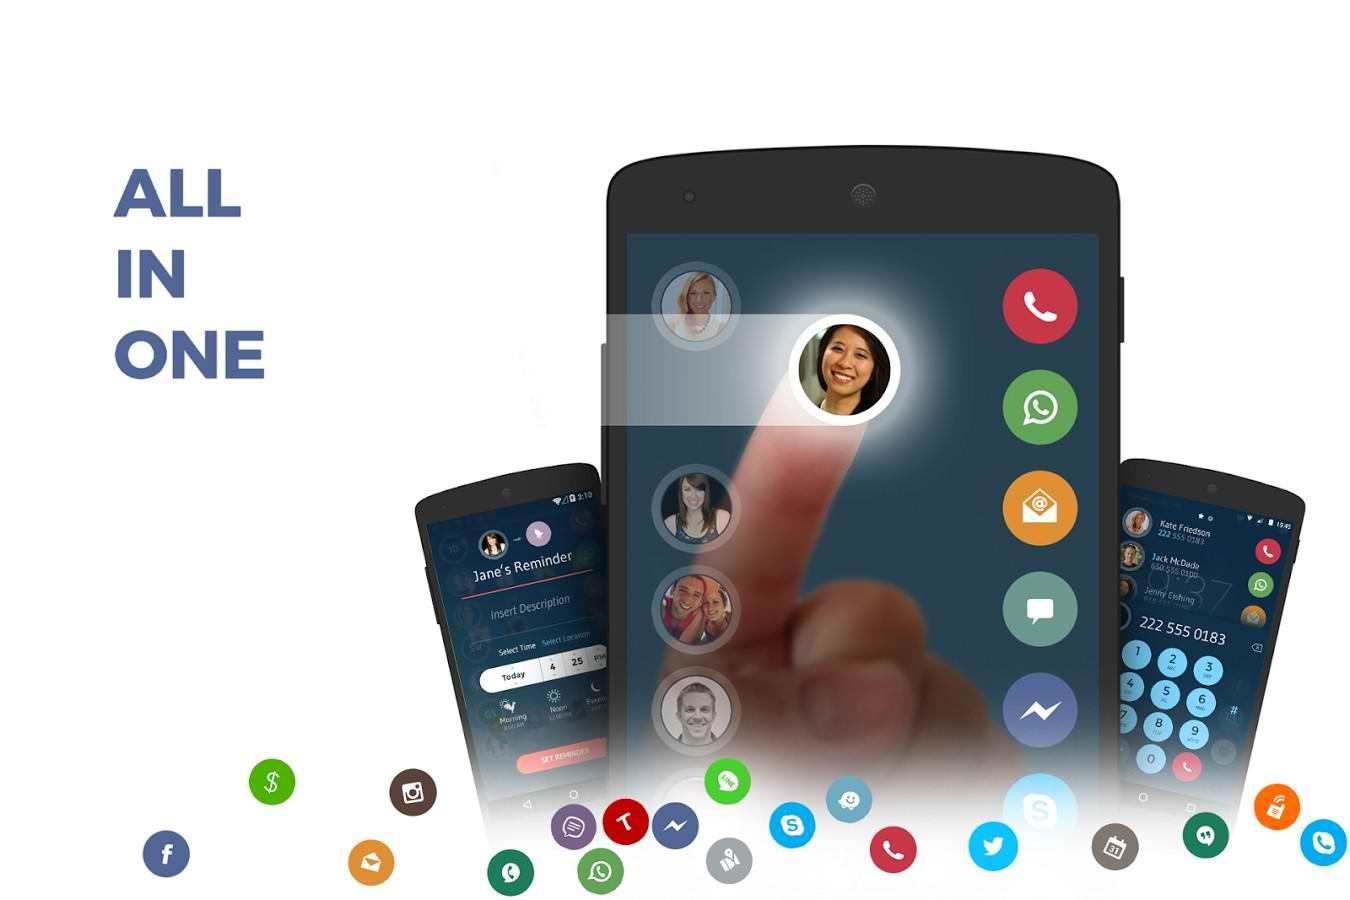 دانلود برنامه مدیریت تماس اندروید Contacts, Phone Dialer & Caller ID: drupe